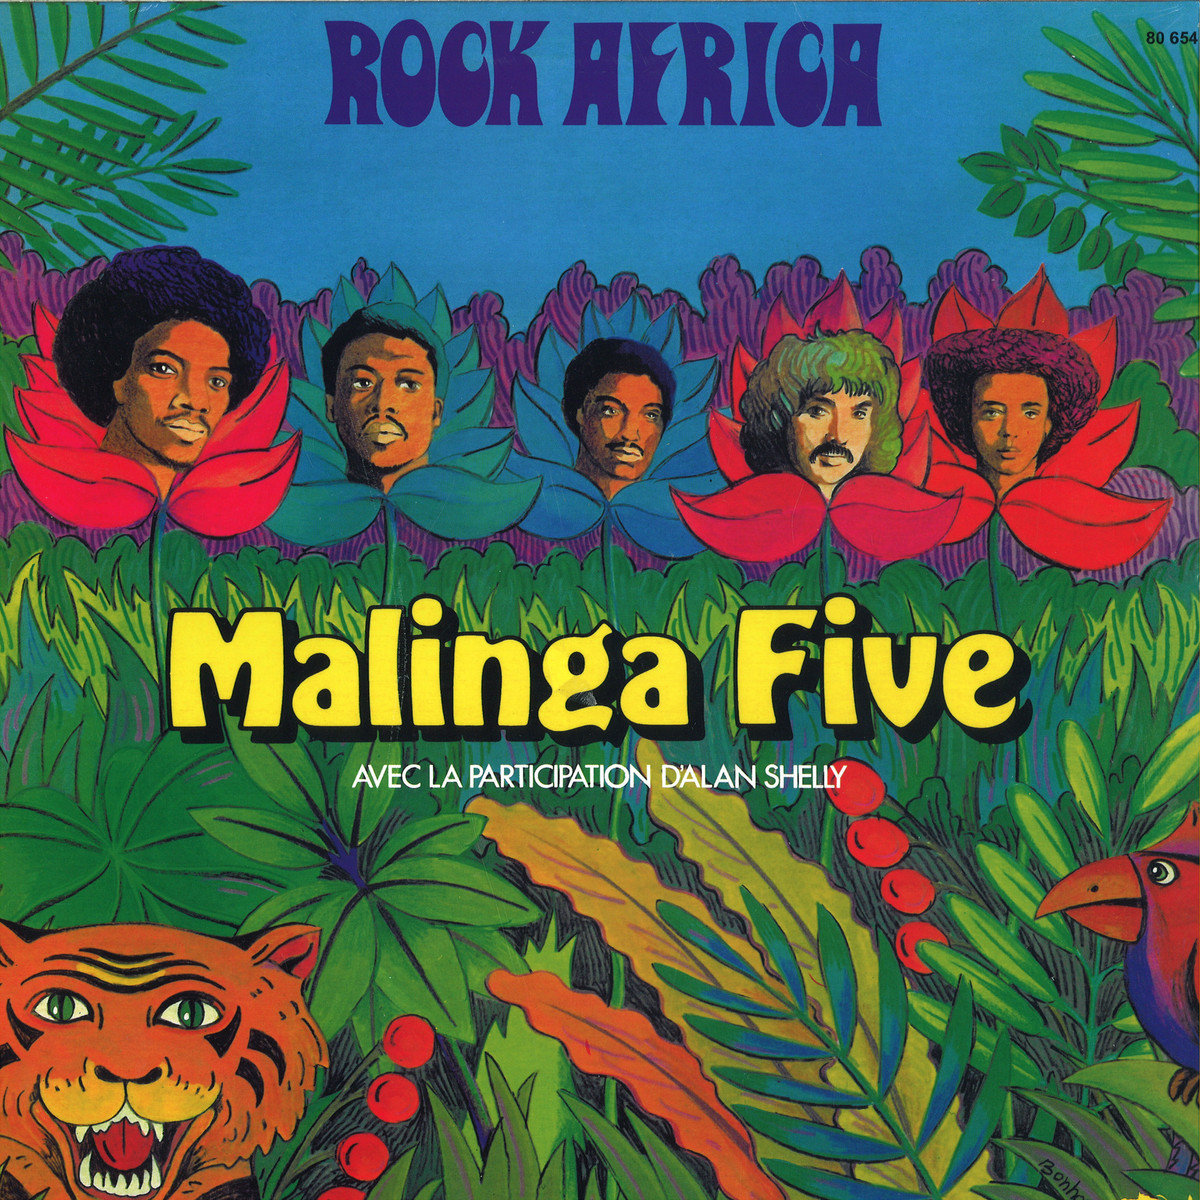 Malinga Five - Marie Thérèse / Kalimbo